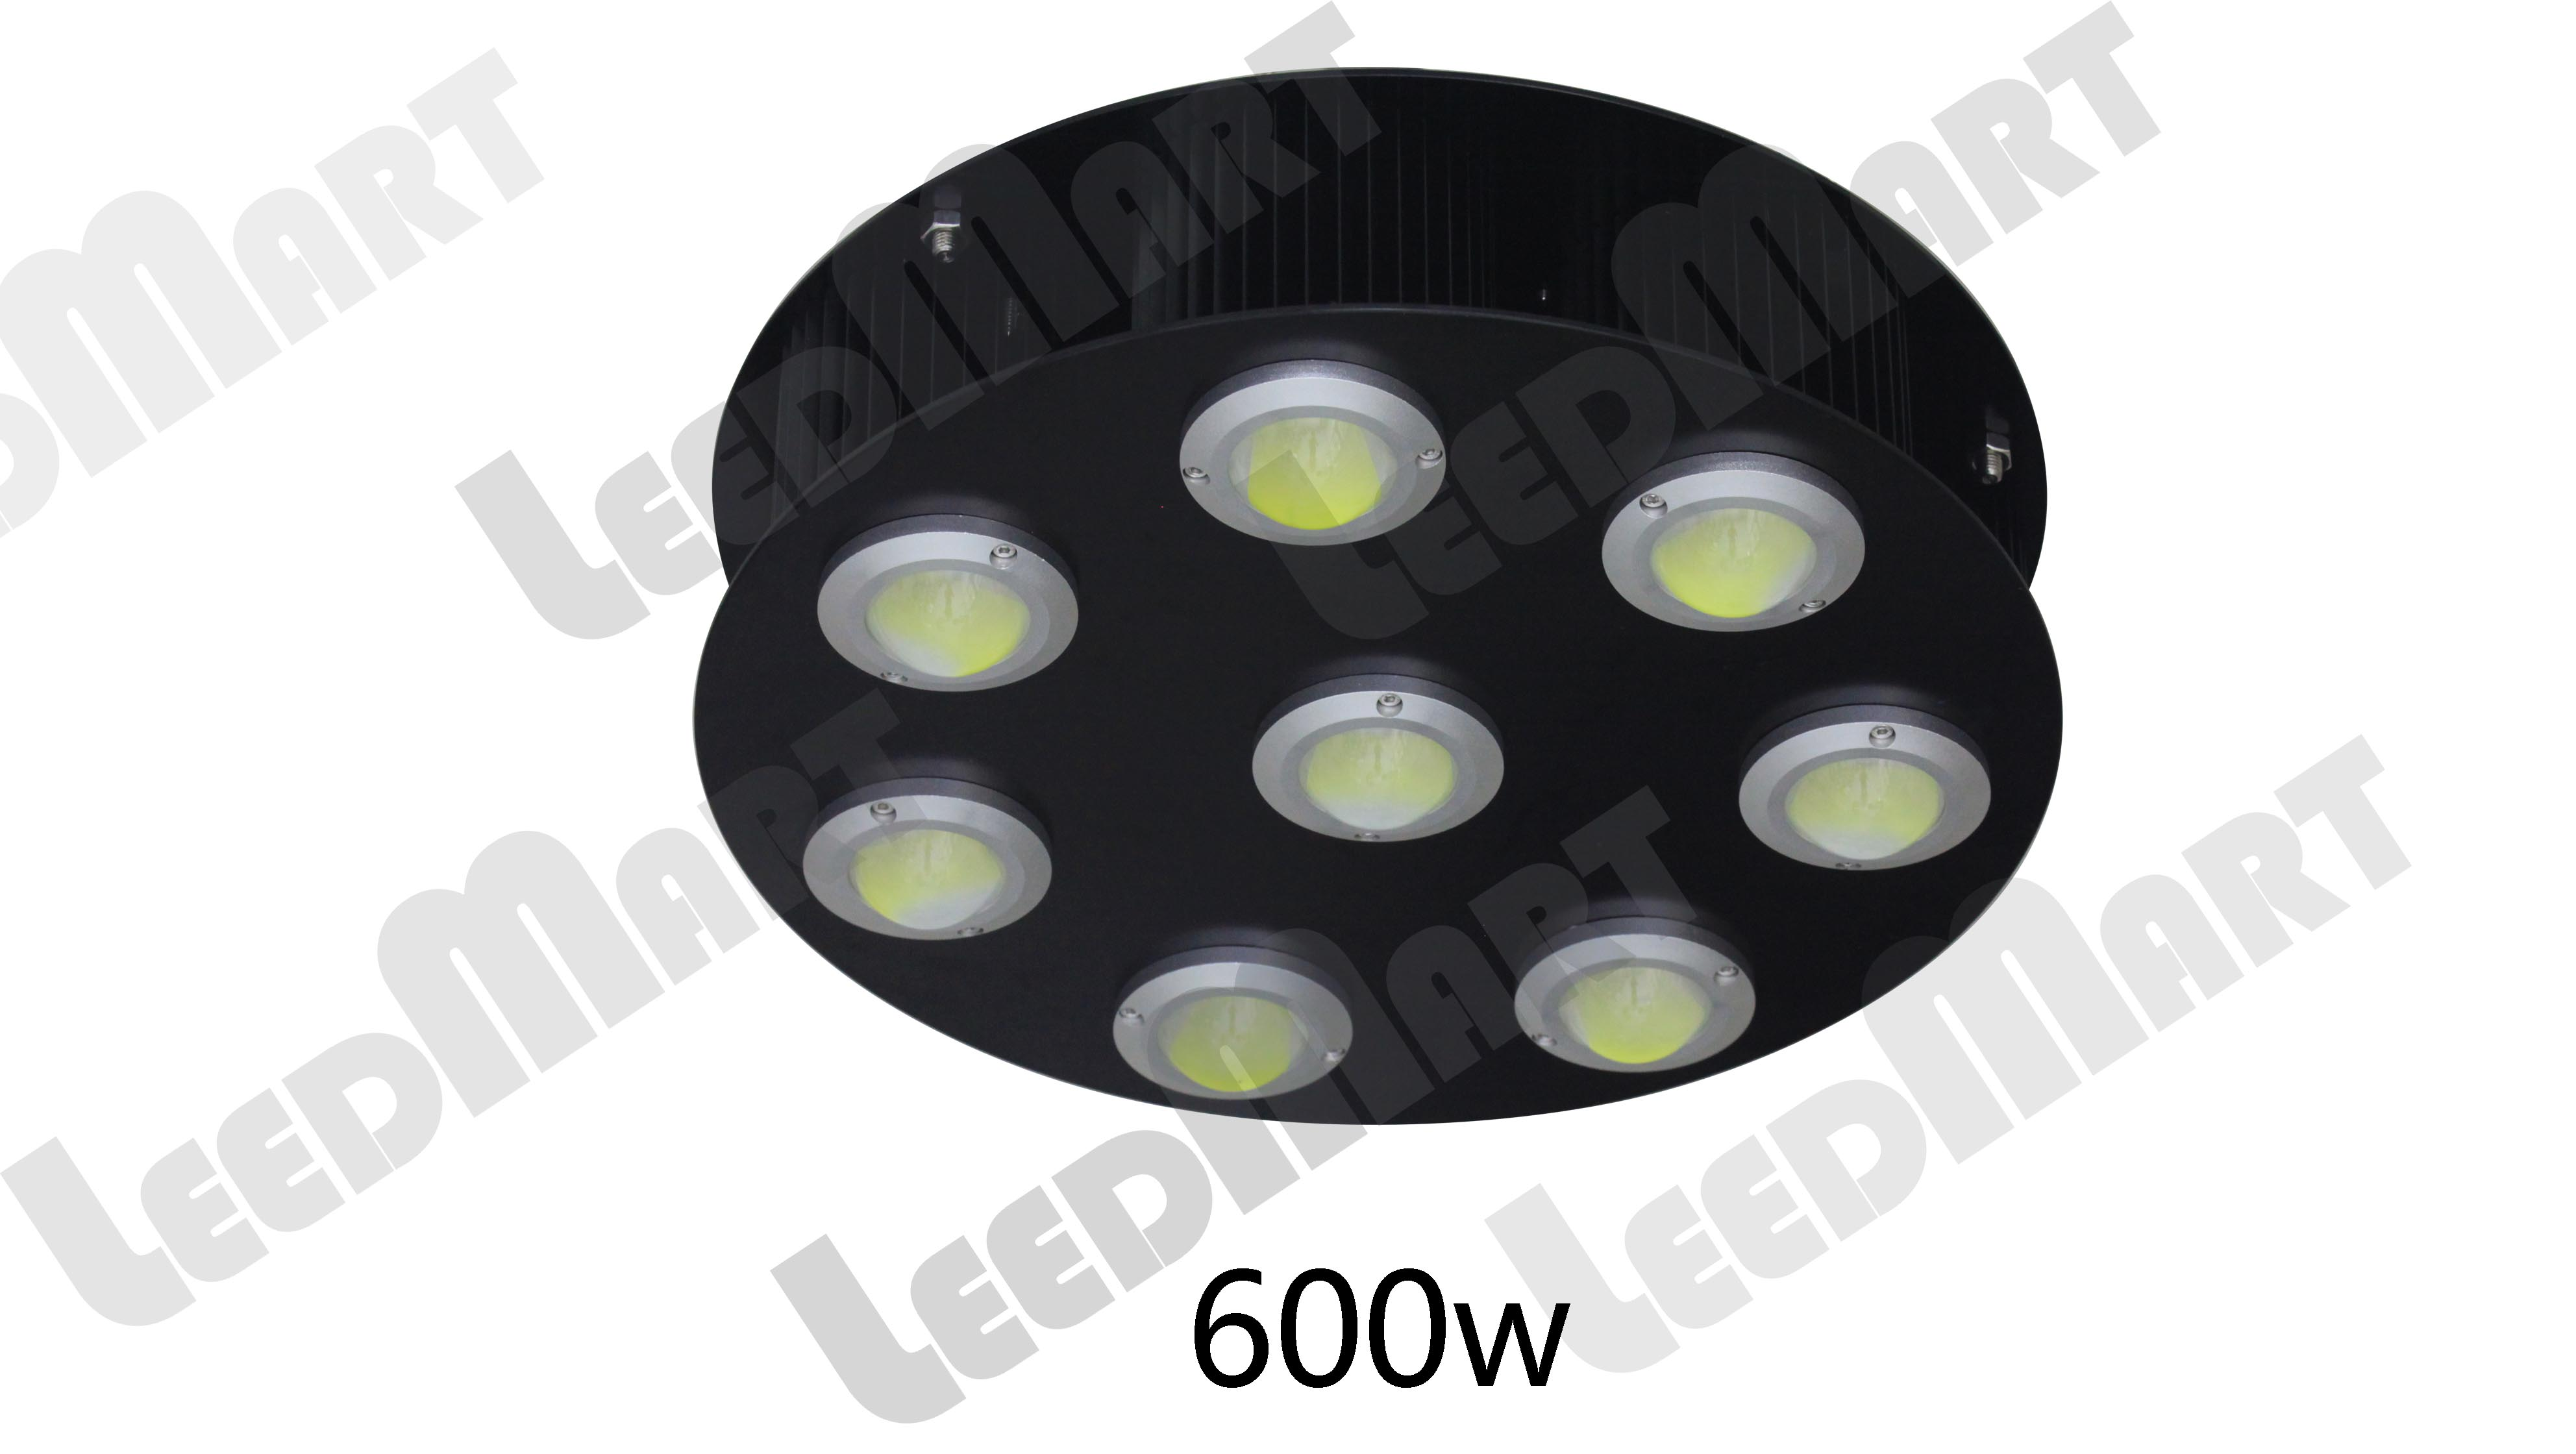 Good quality indoor 300 watt -1000 watt 39000 lumen LED high bay light fixture